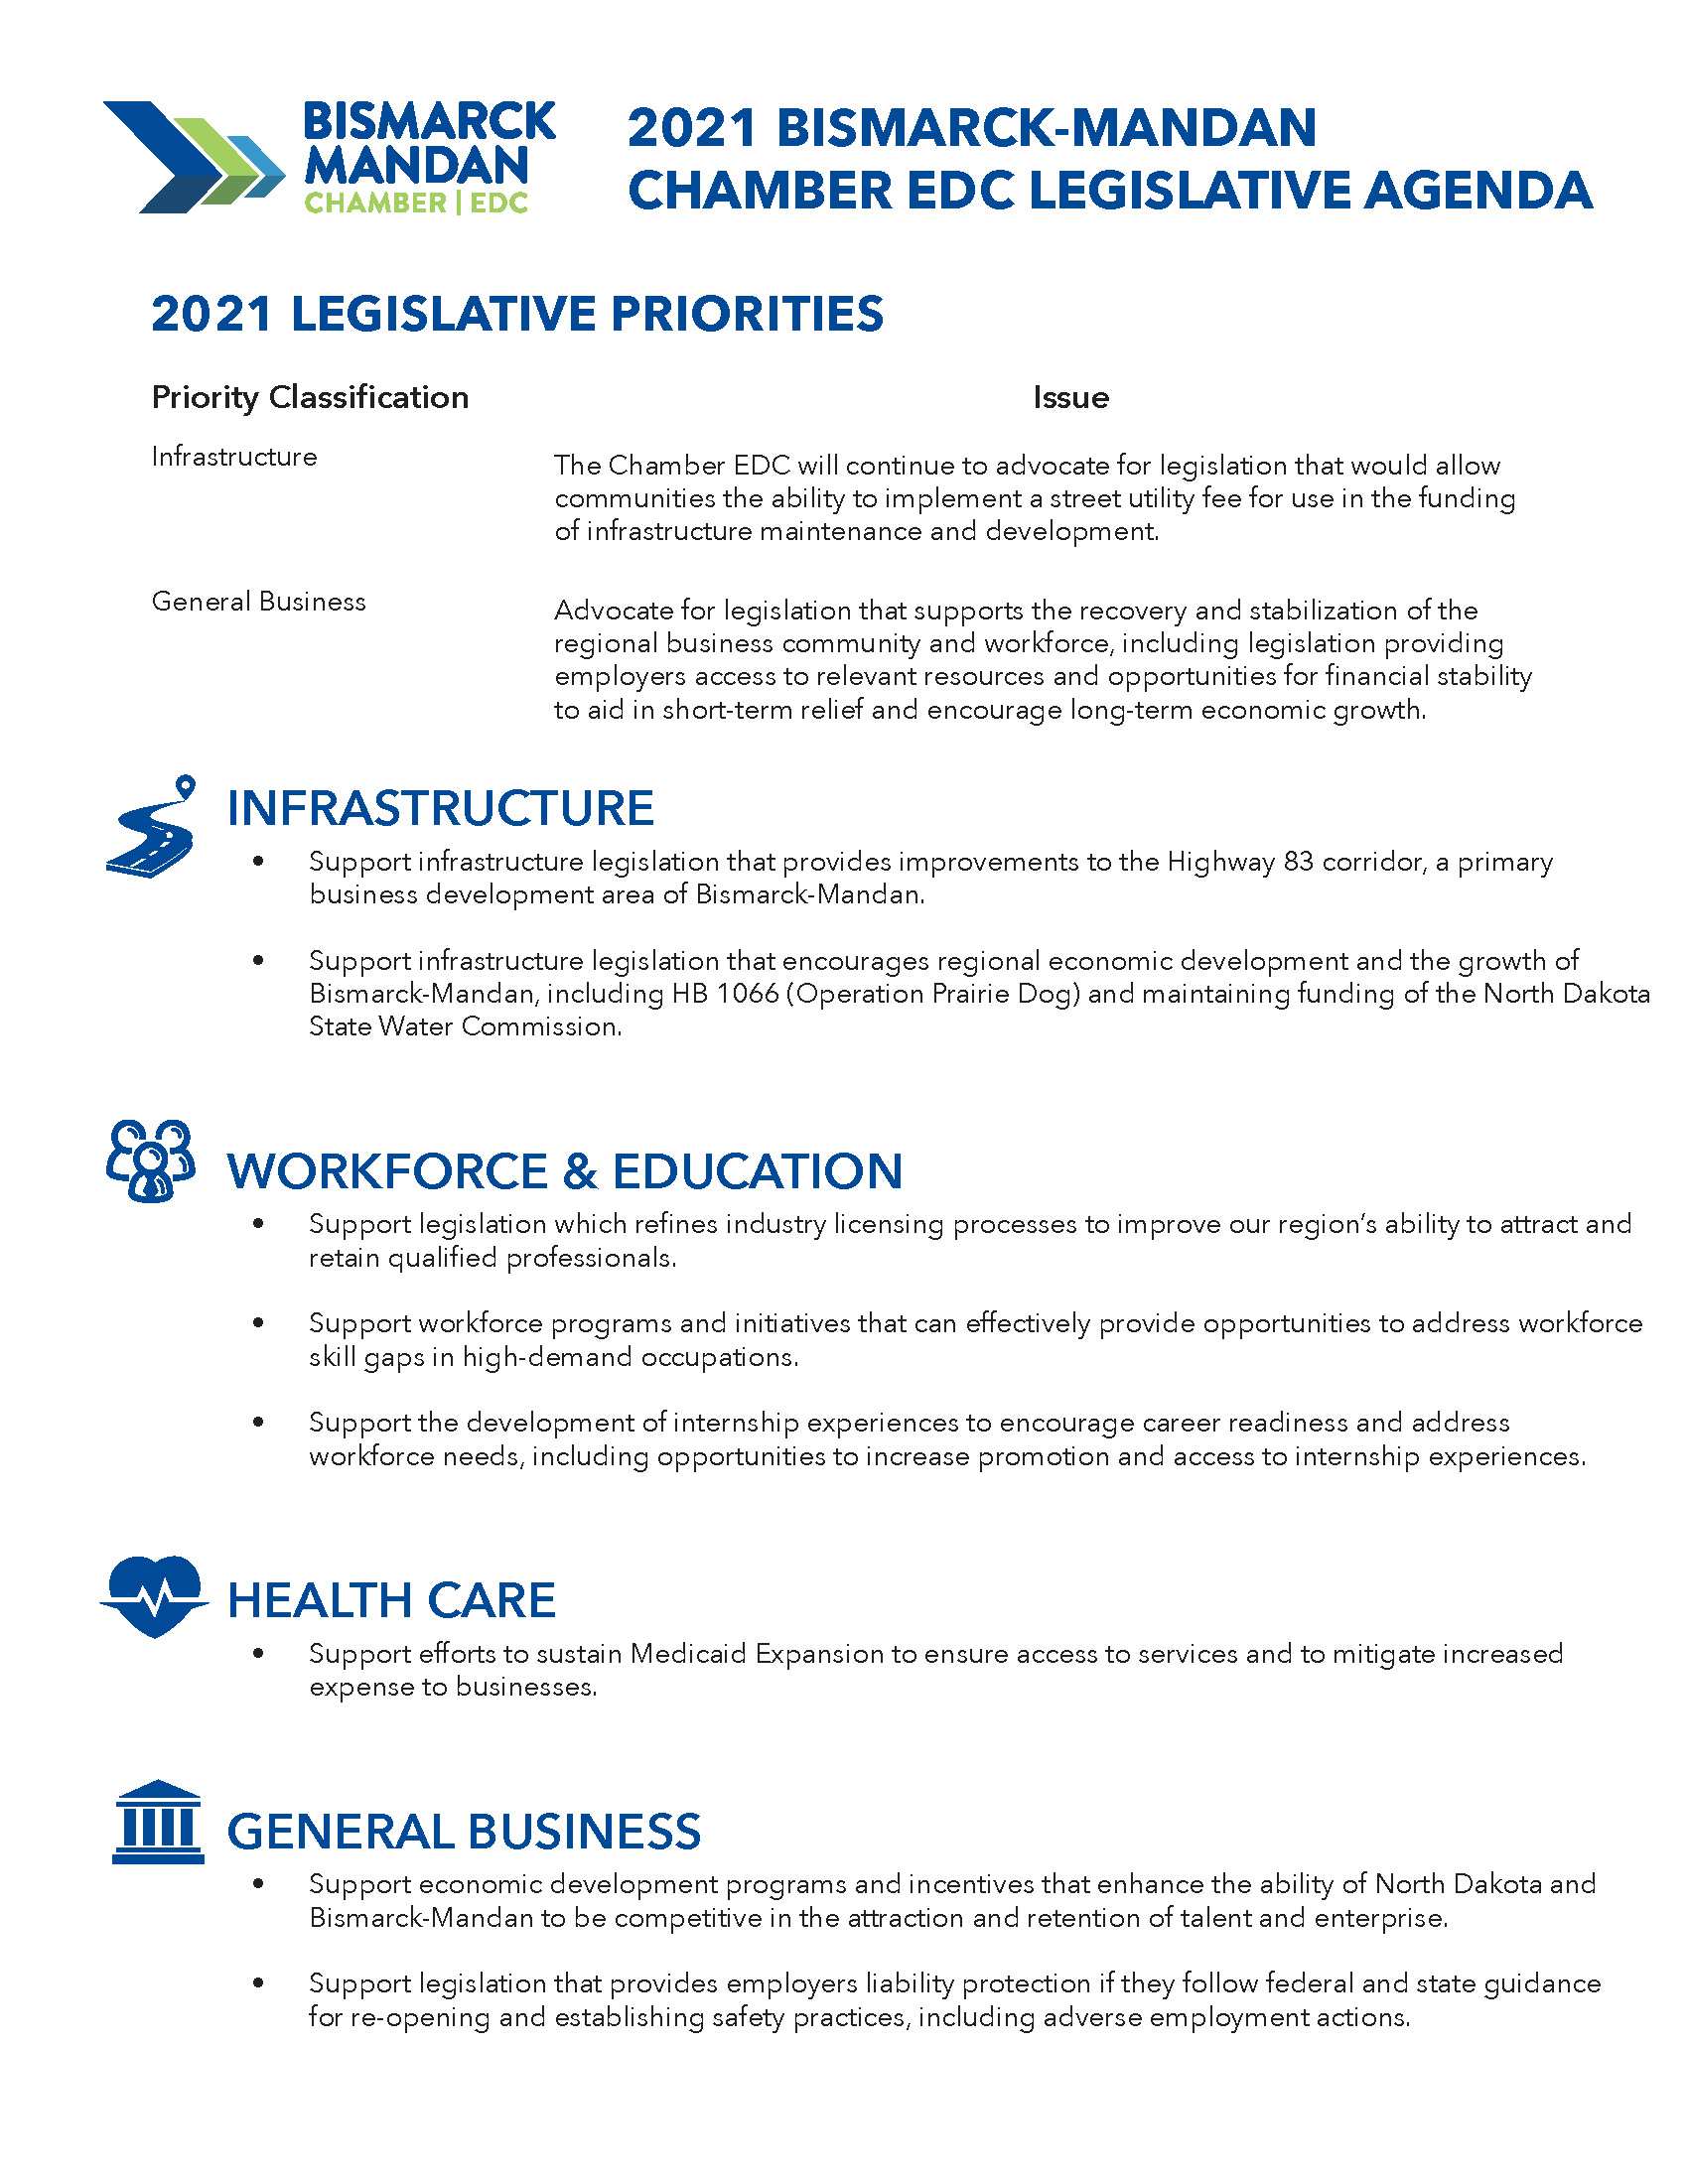 2021 Legislative Agenda